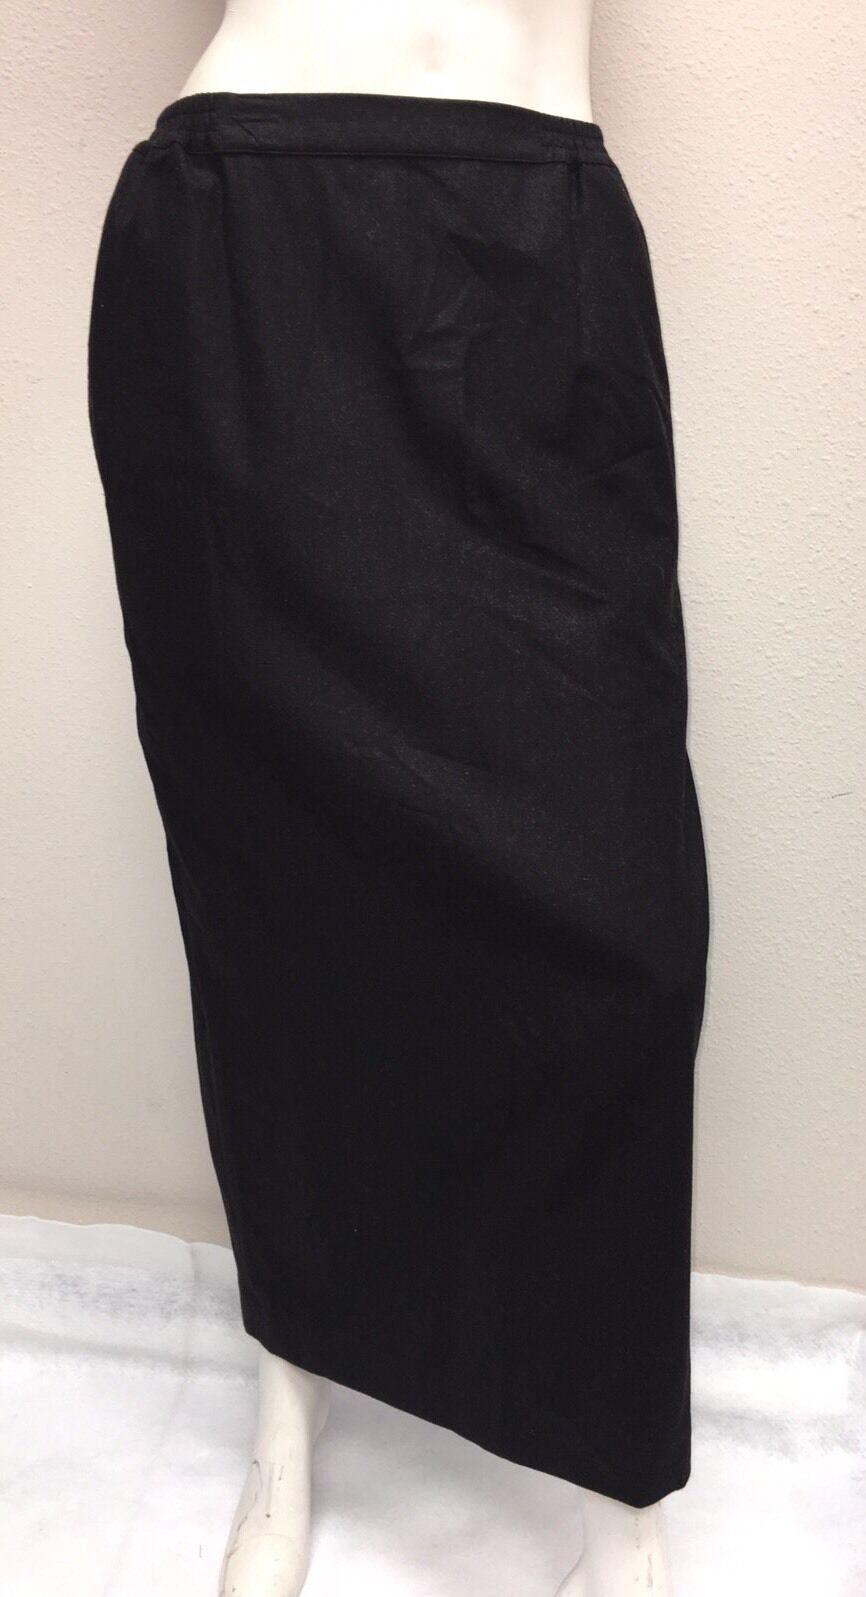 Eskandar size 1 99% Wool 1% Cashmere Brown Straight Pencil Skirt elastic waist